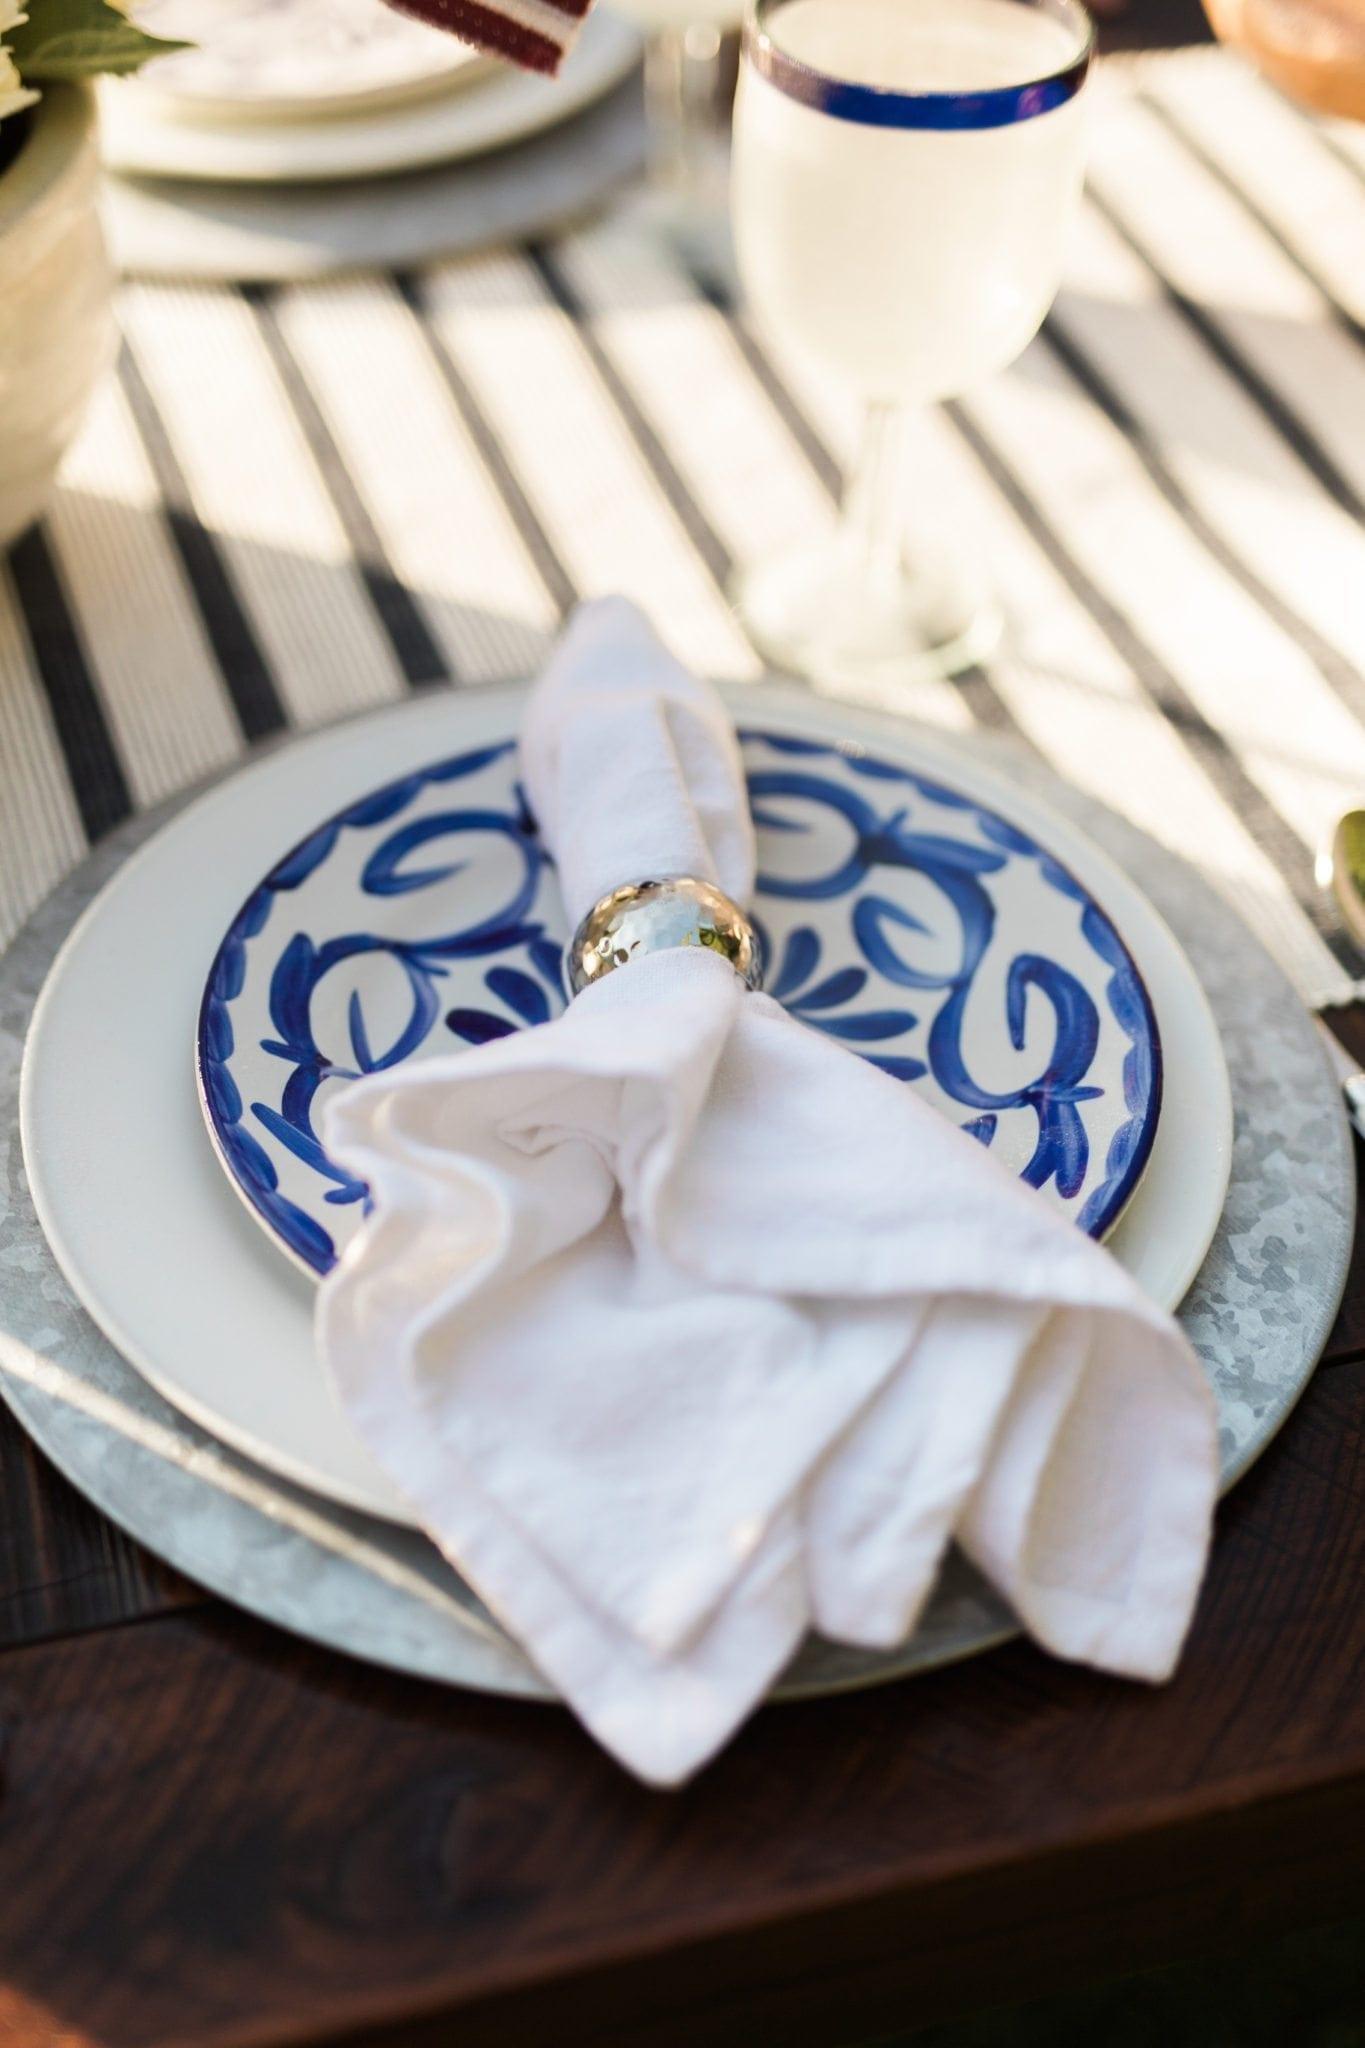 Blue and white dishware. White linen napkin and silver napkin ring.